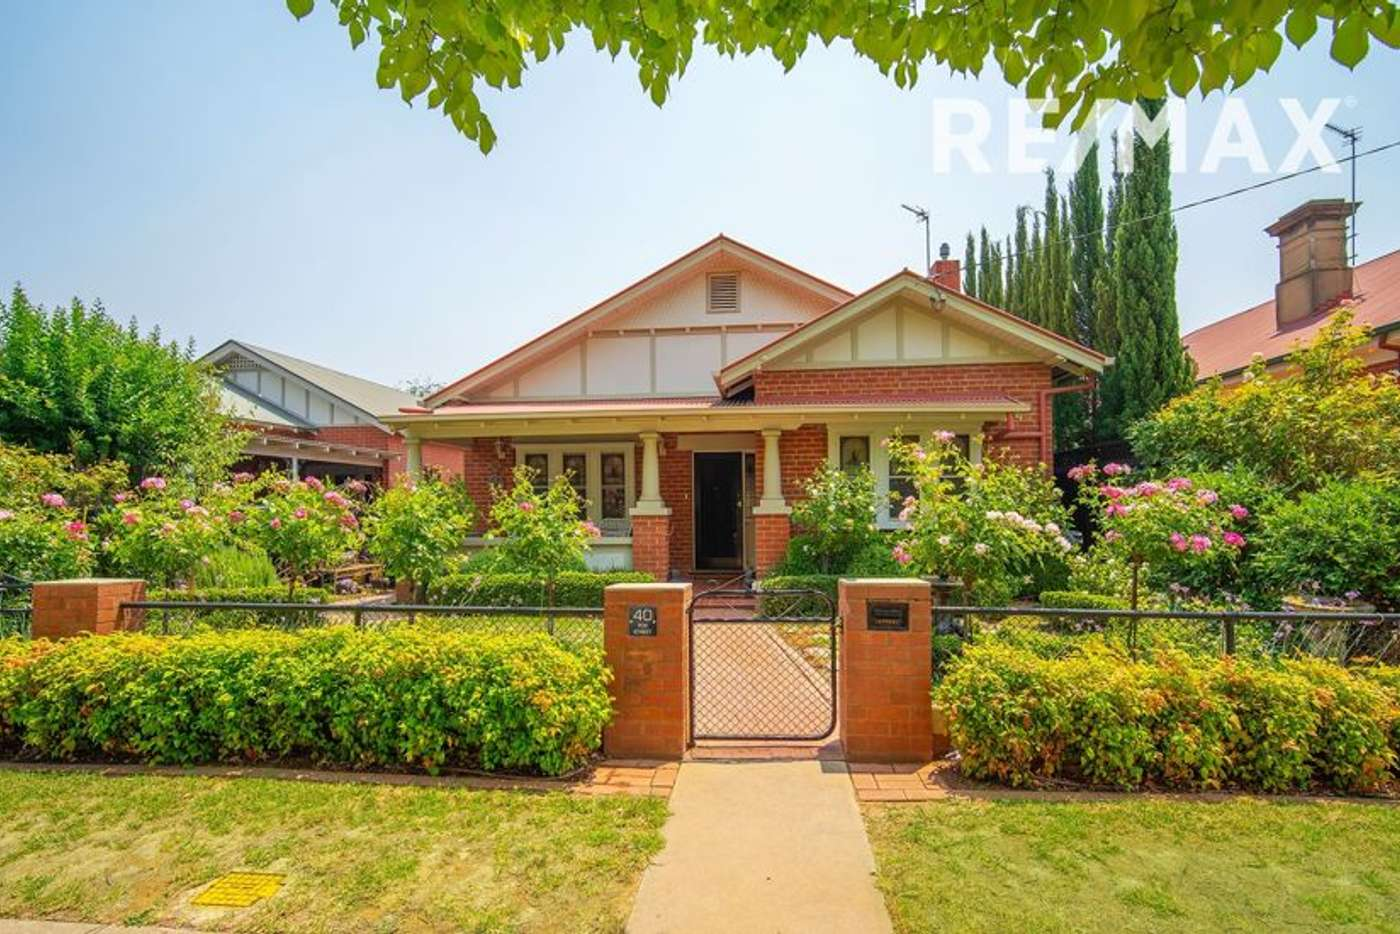 Main view of Homely house listing, 40 Fox Street, Wagga Wagga NSW 2650